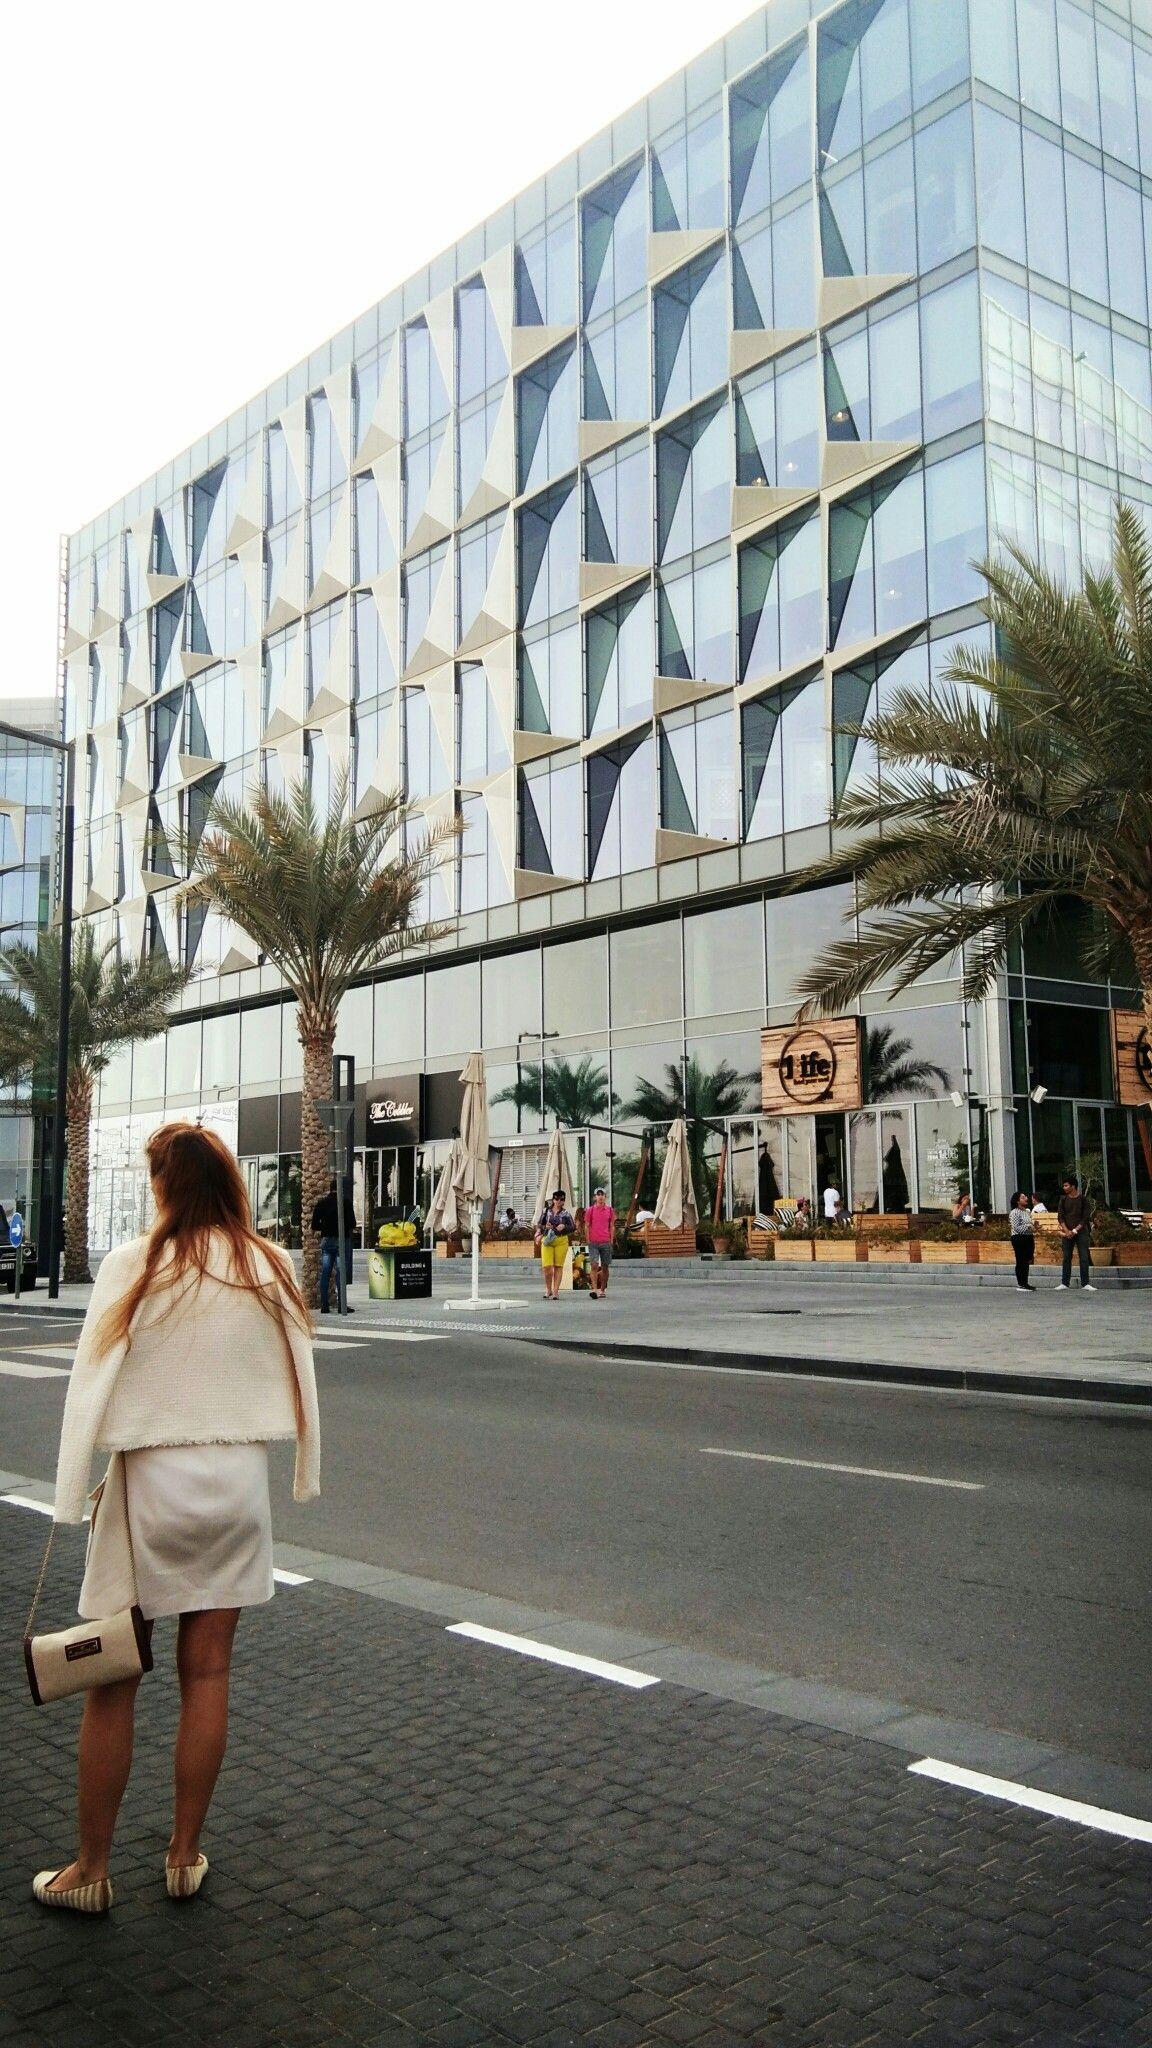 Places To Visit In Dubai D3 Dubai Design District The Ghome Of Creative Minds Fashion Food Designs Architecture Socialmed Places To Visit Travel Dubai